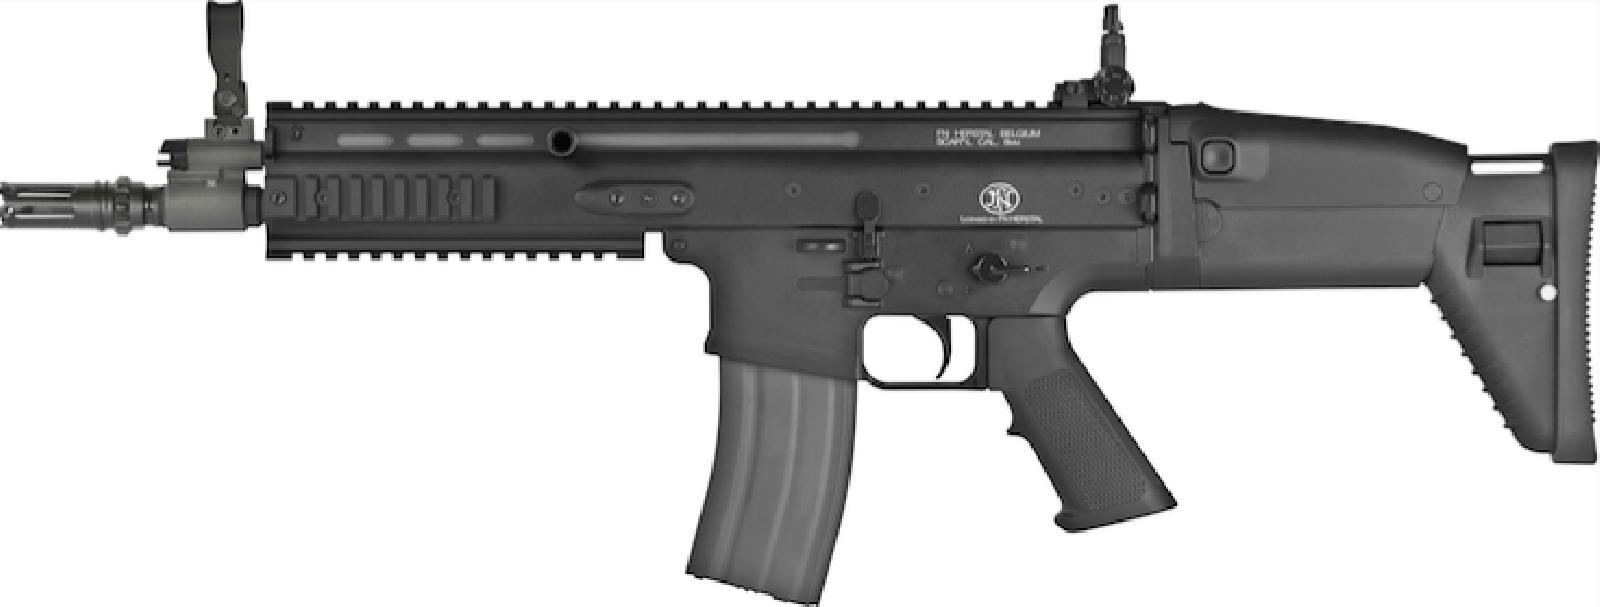 METAL AEG FN SCAR – BLACK product image